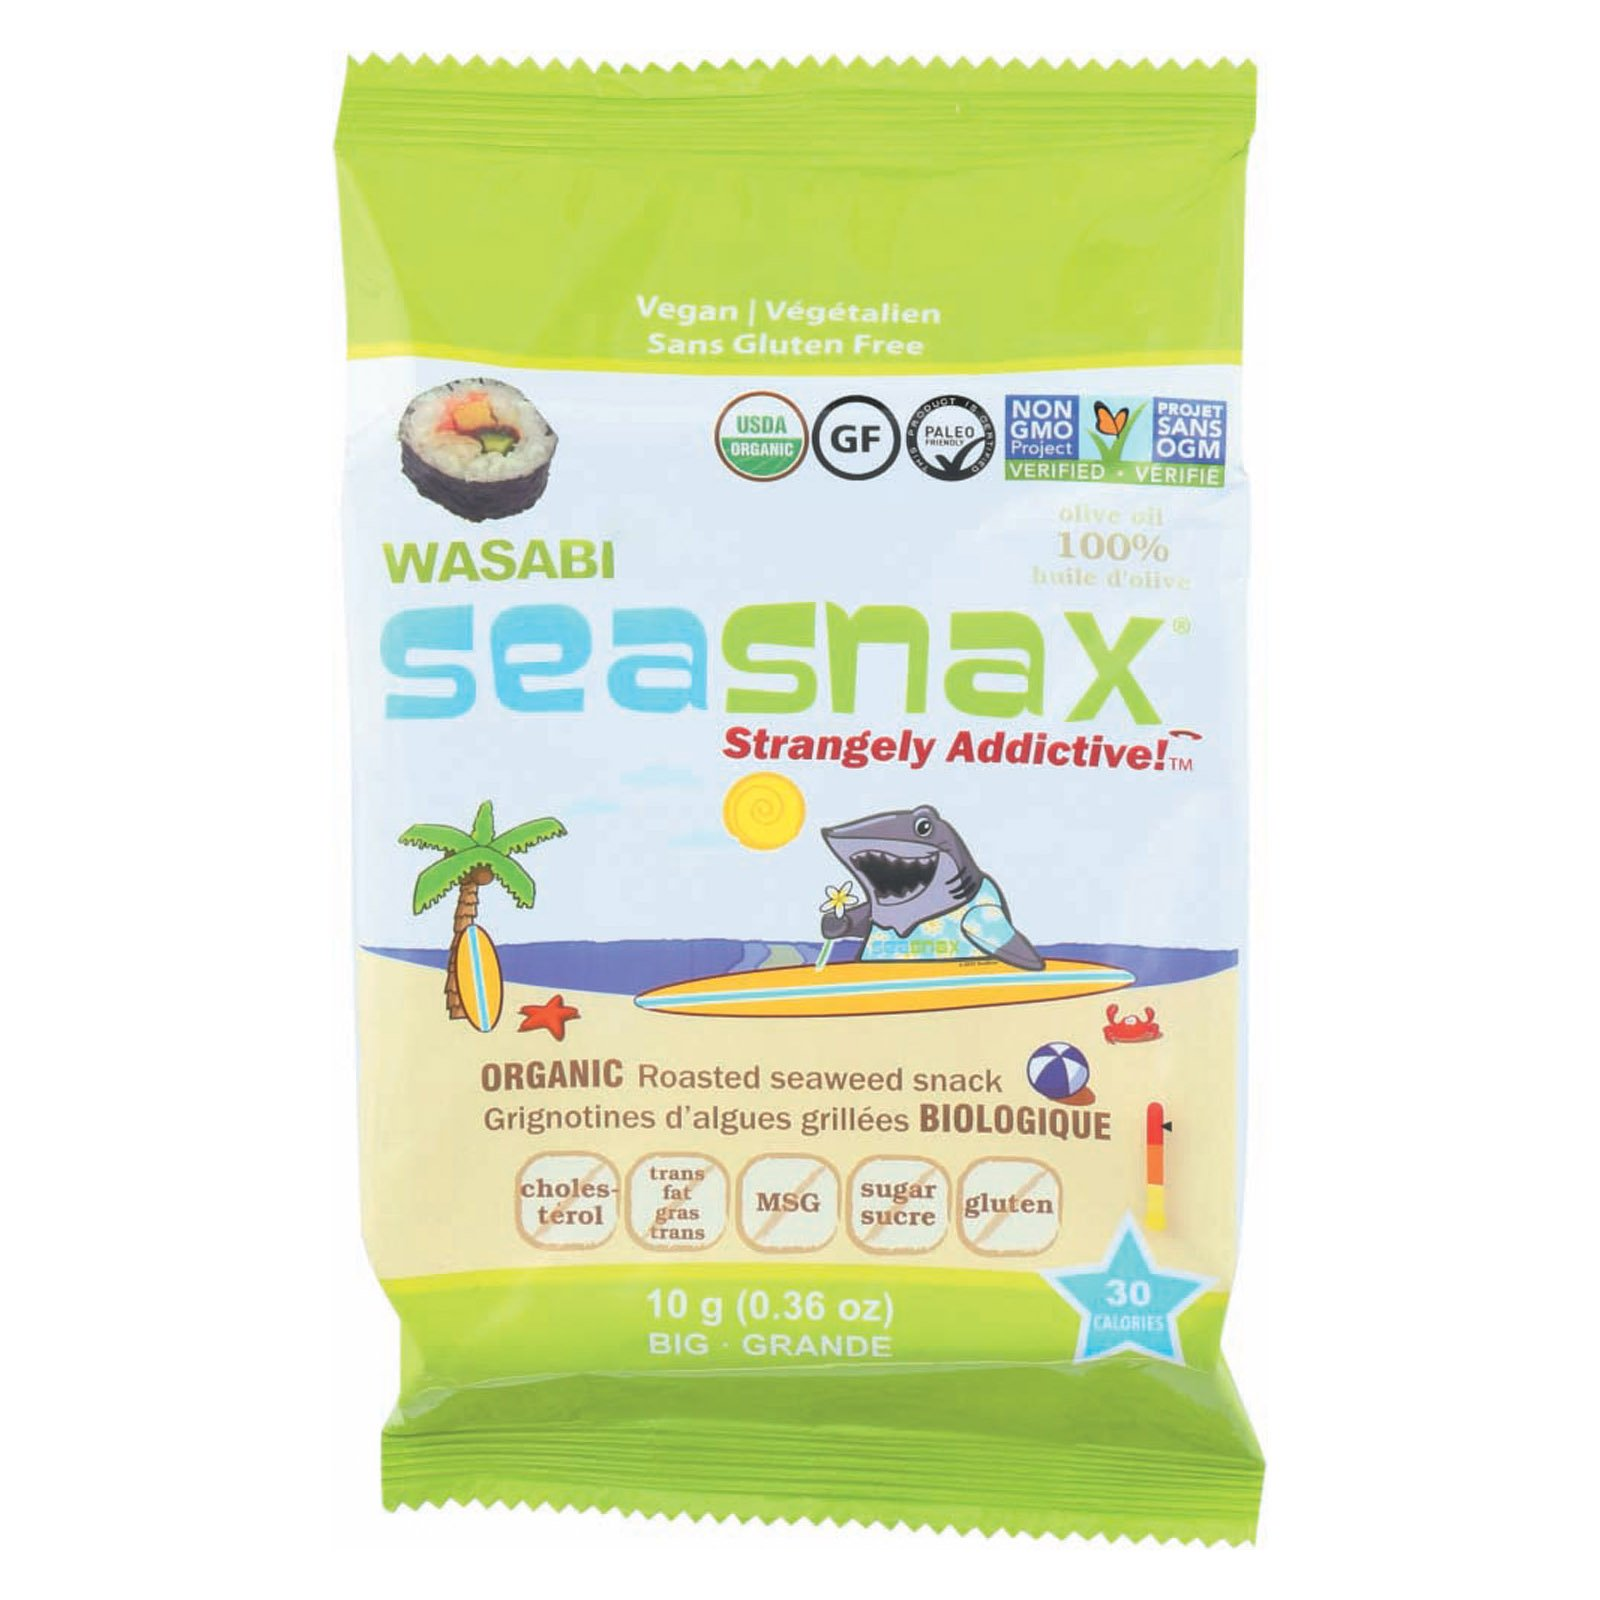 Seasnax, Seaweed Snack Big Grab Wasabi Organic, 0.36 Ounce